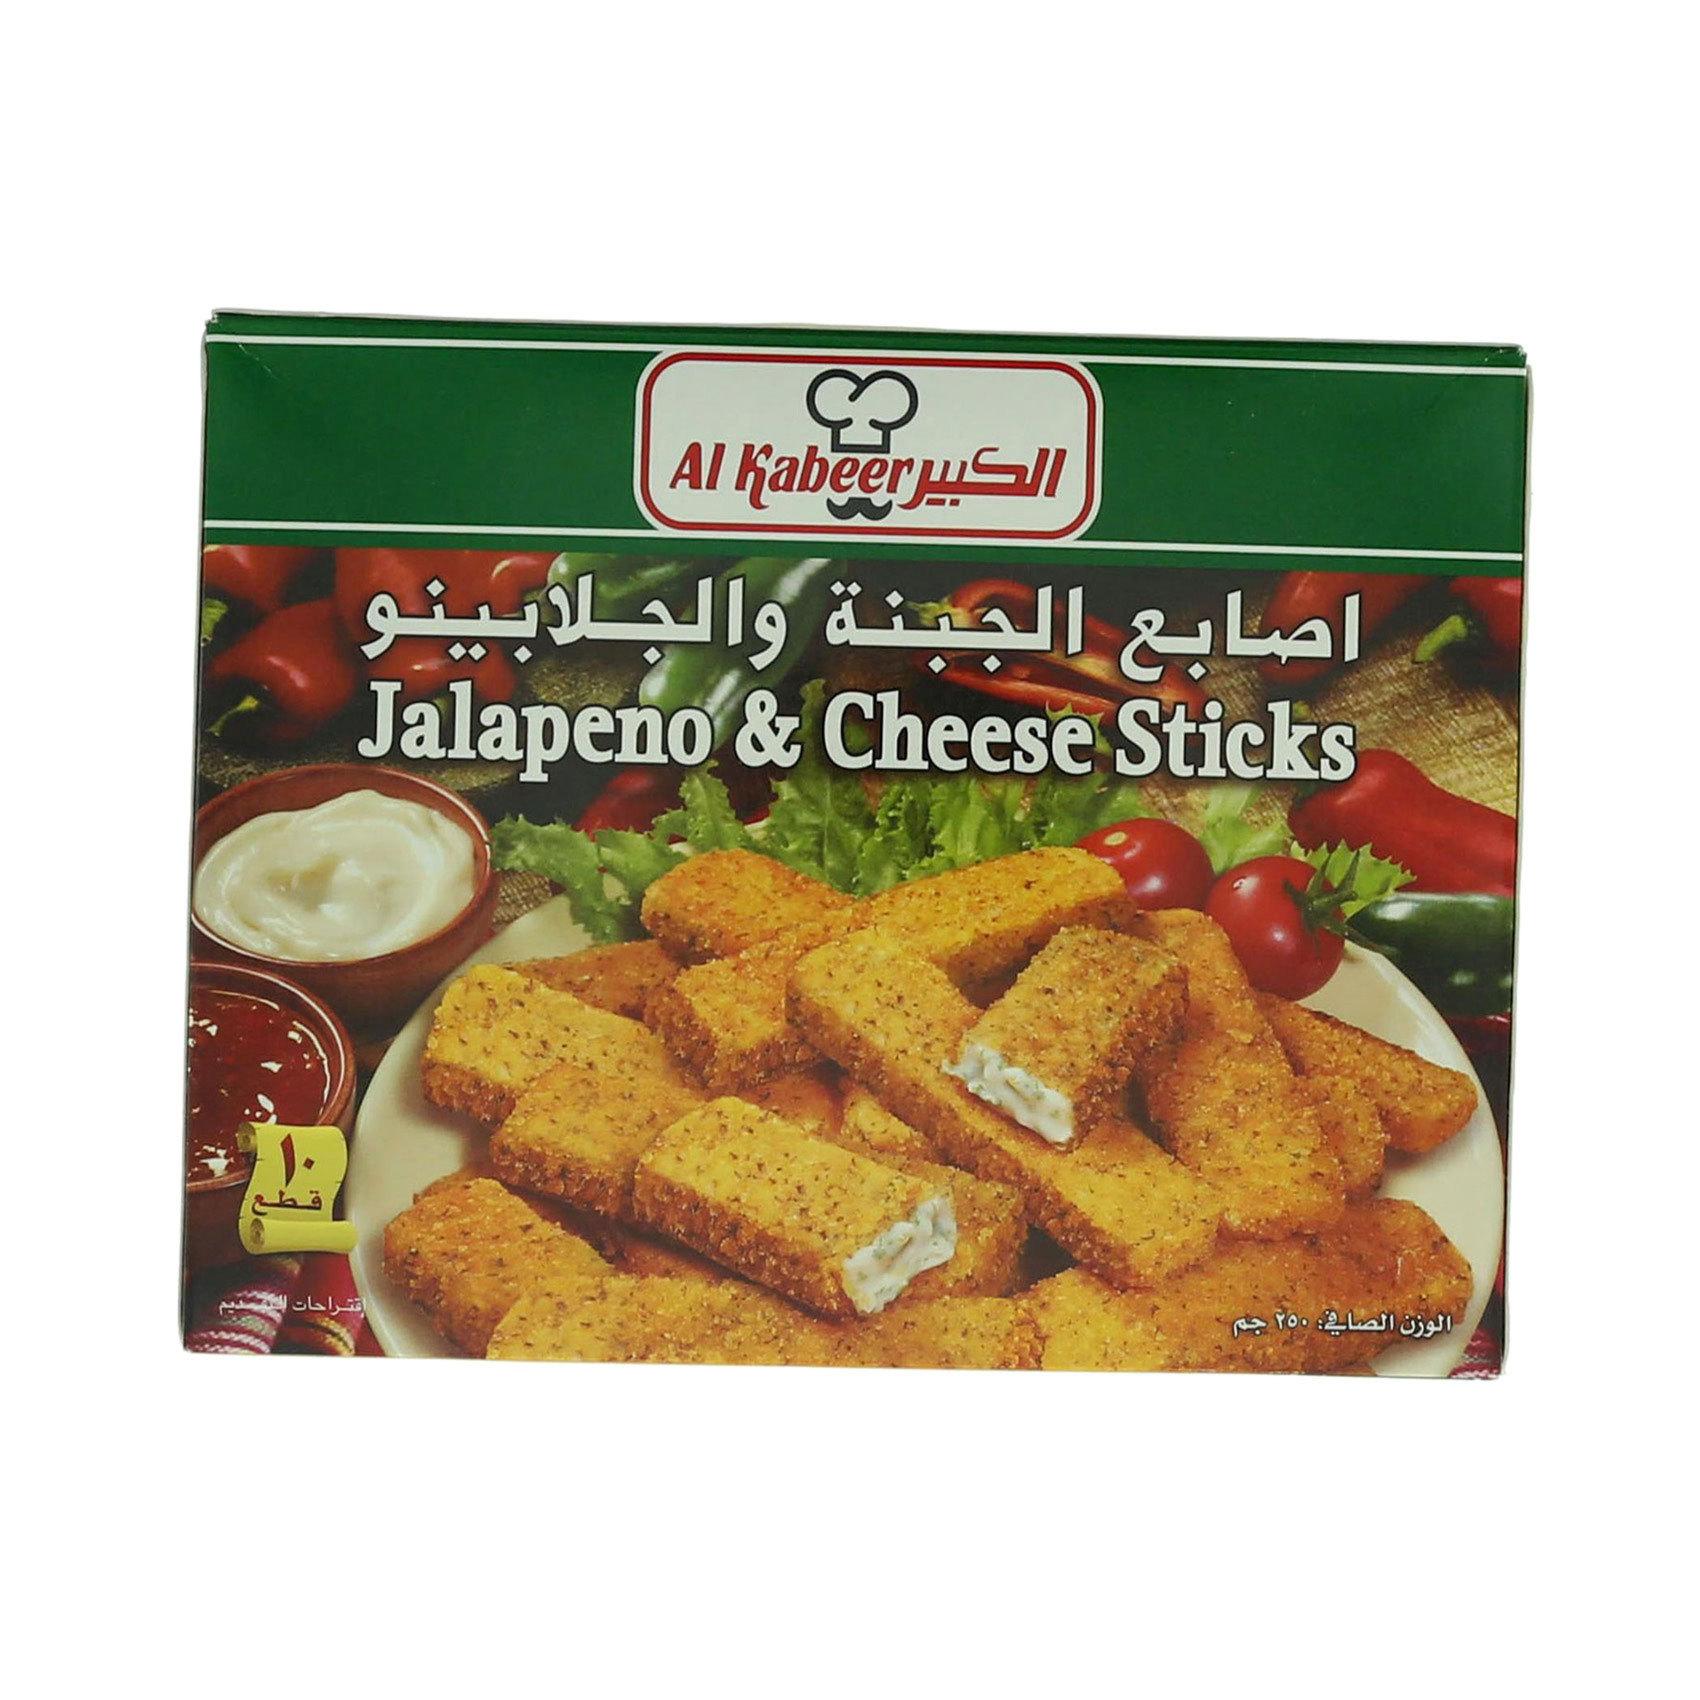 AL KABEER STICKS JALAP/CHEESE 250G